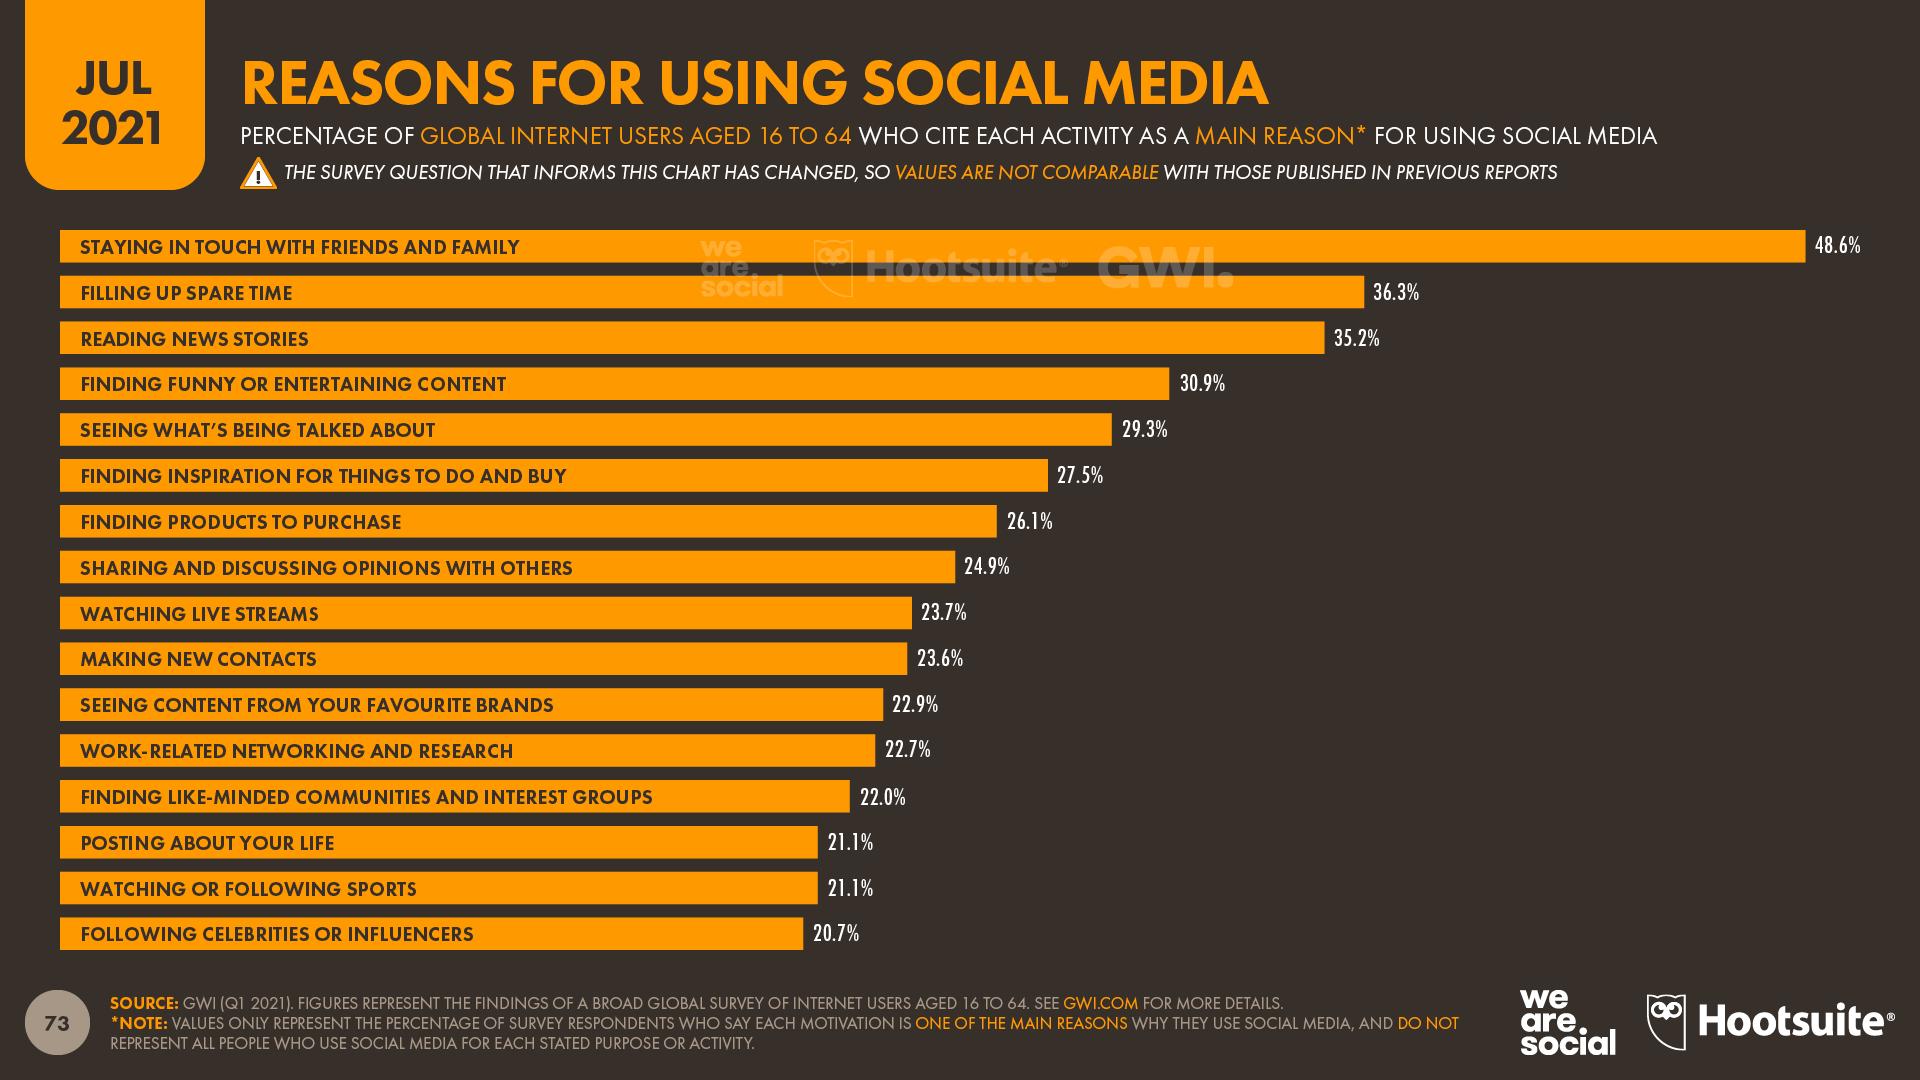 Reasons for Using Social Media July 2021 DataReportal